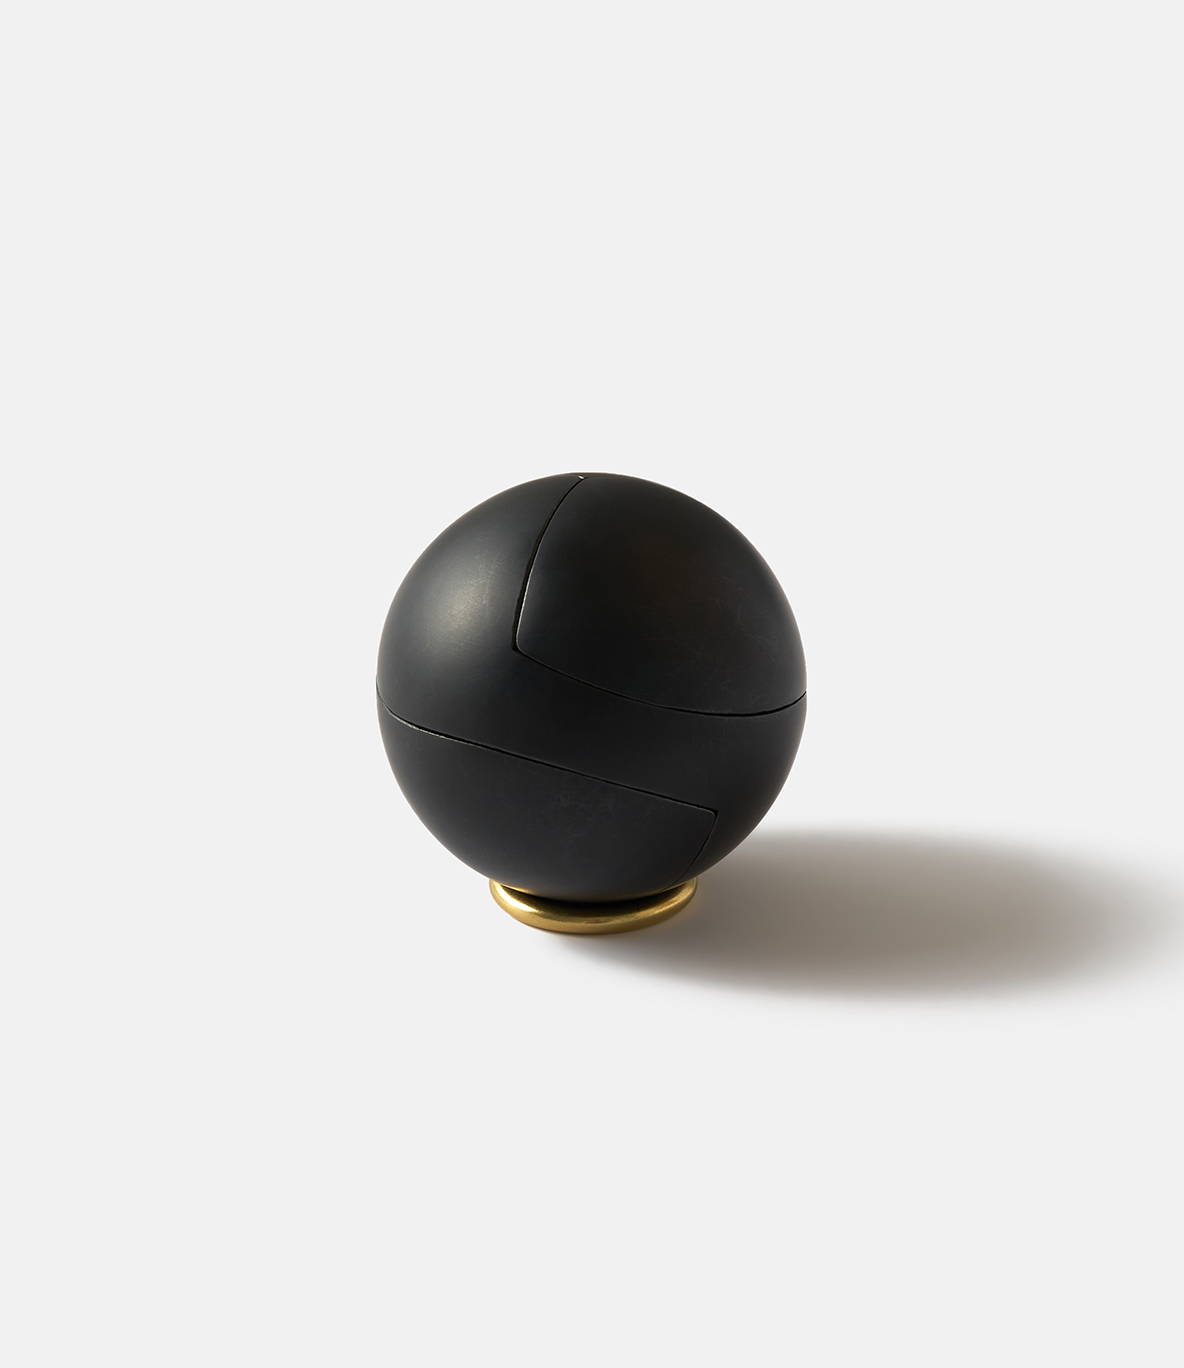 Craighill Venn Puzzle Carbon Black — головоломка из стали: чёрный карбон